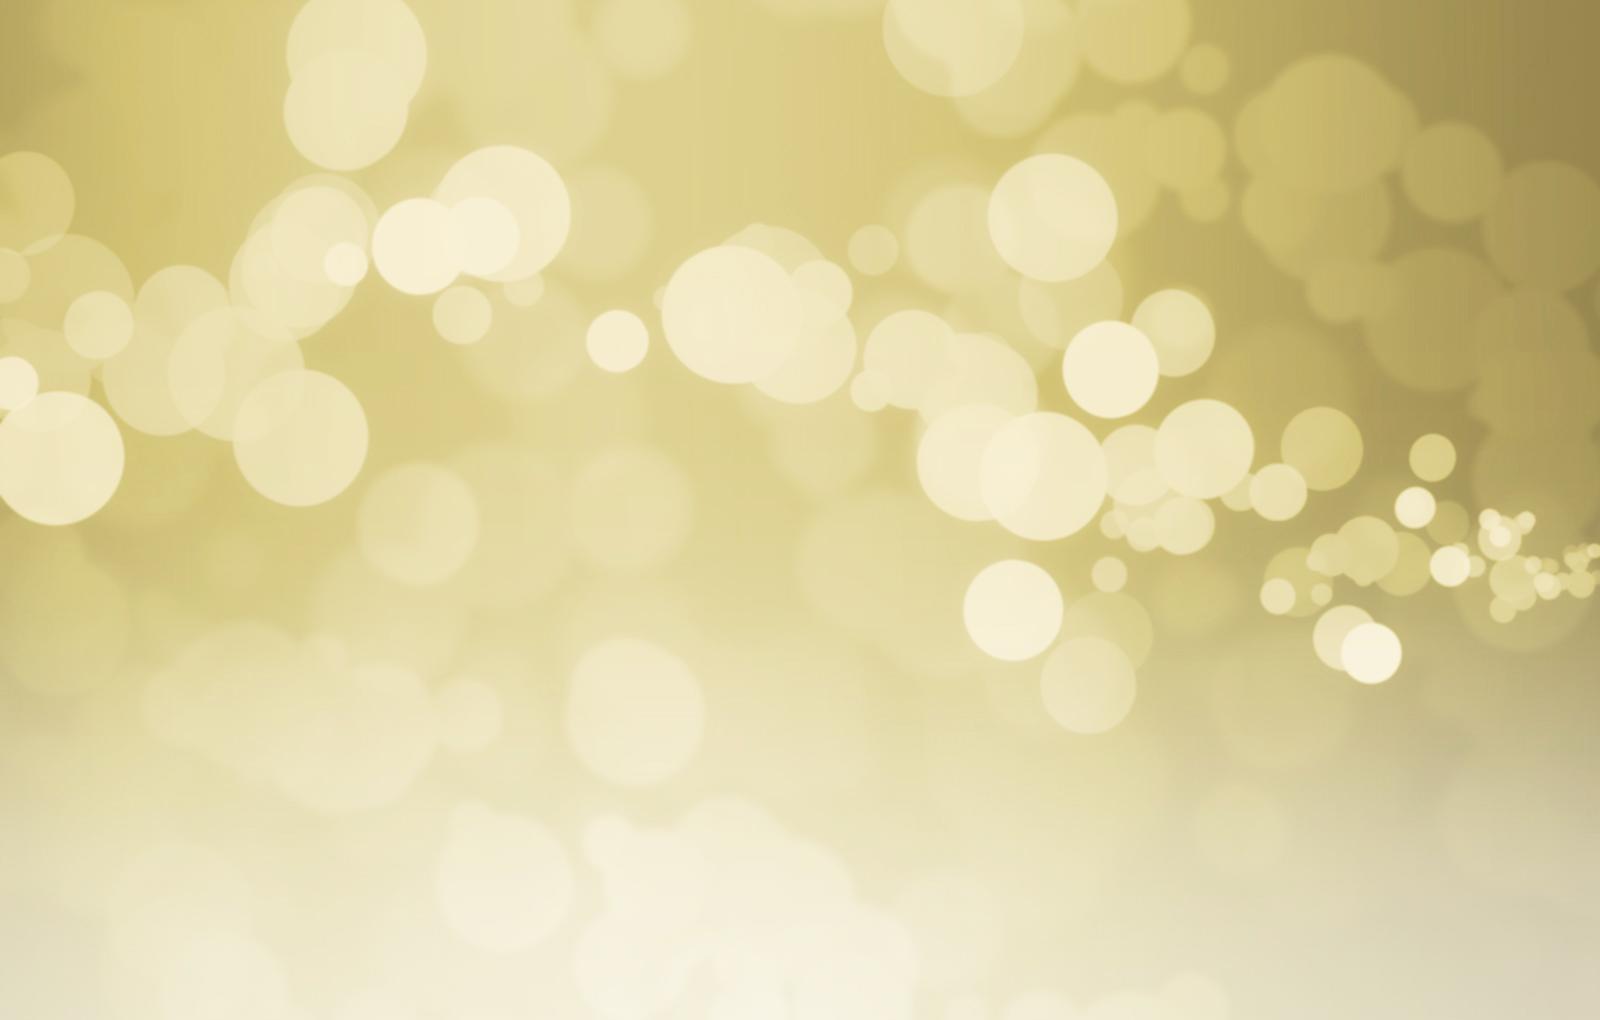 The_Ecstacy_of_Awakening_Gold_Bubbles.jpg